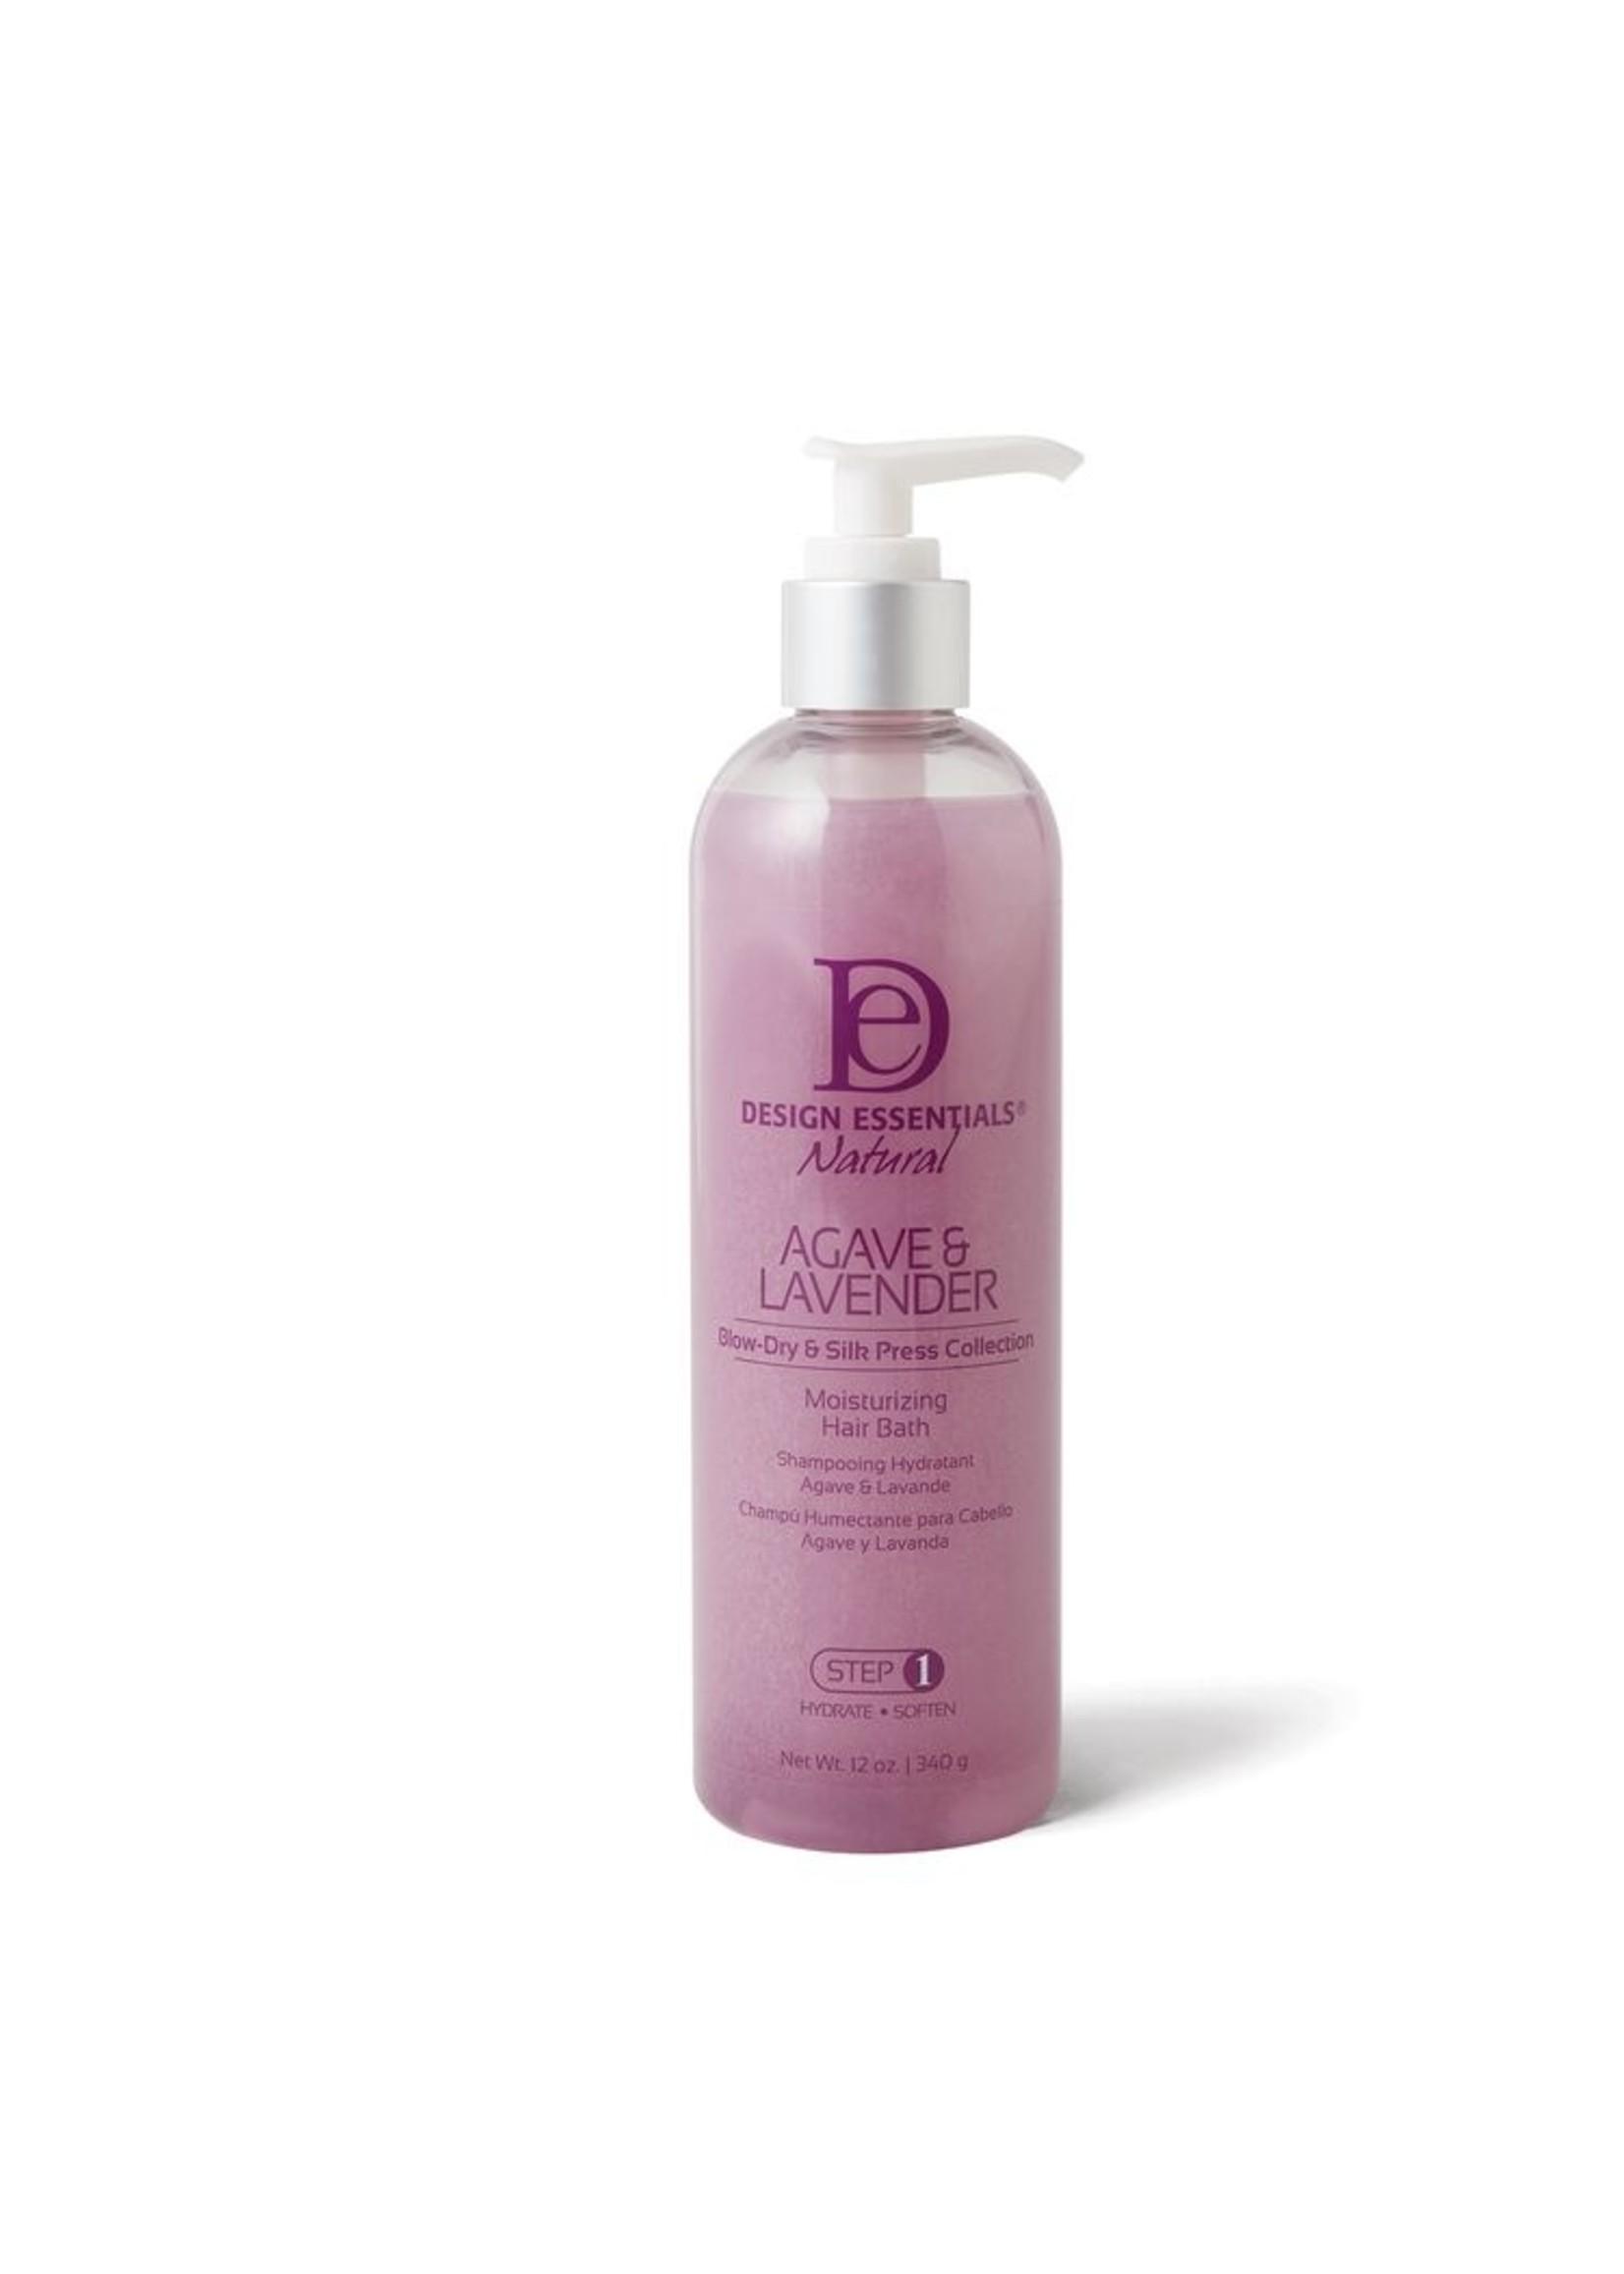 Design Essentials Agave & Lavender Moisturizing Hair Bath